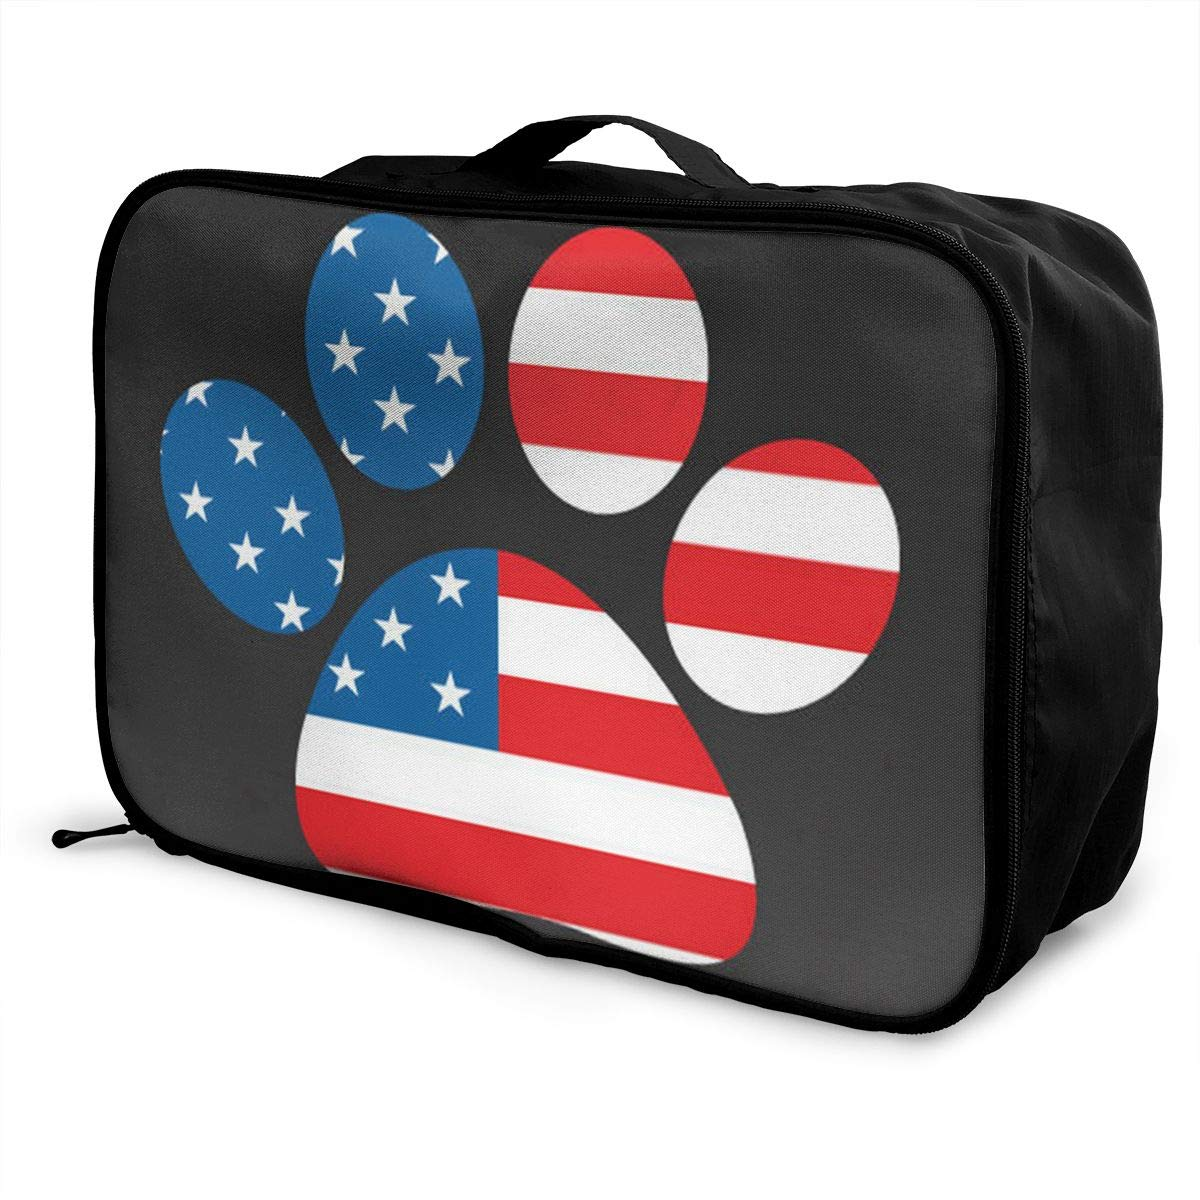 Travel Luggage Duffle Bag Lightweight Portable Handbag American Flag Large Capacity Waterproof Foldable Storage Tote